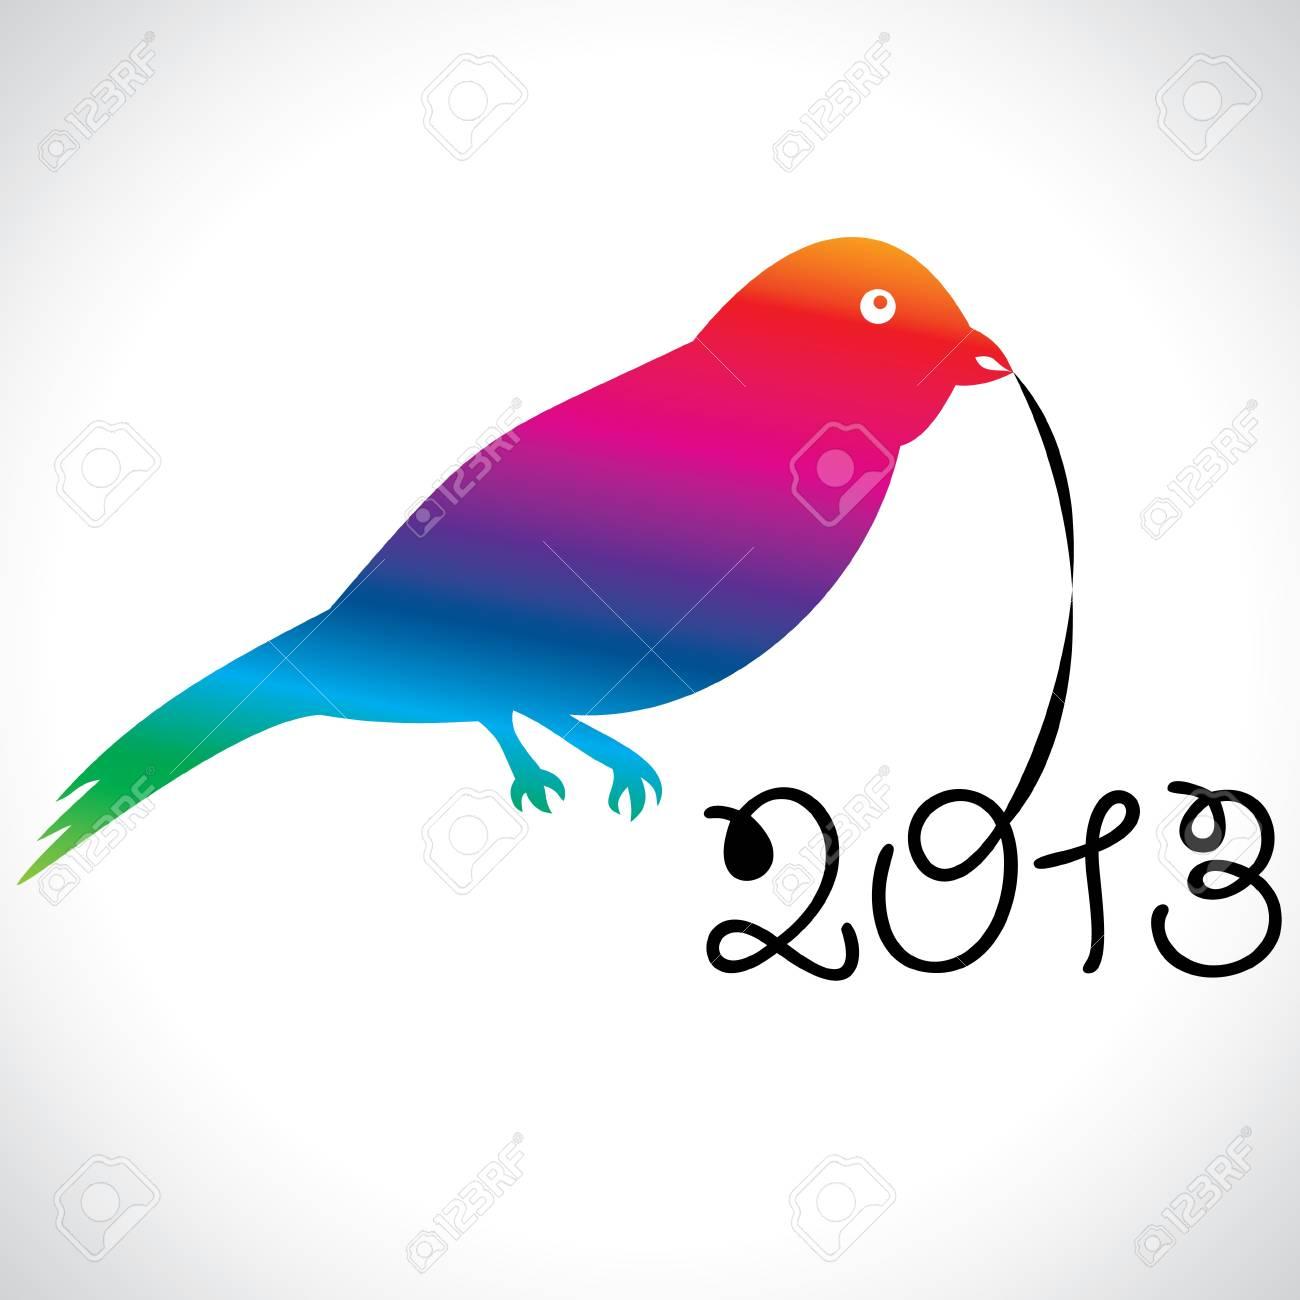 bird with happy new year 2013 Stock Vector - 18268936